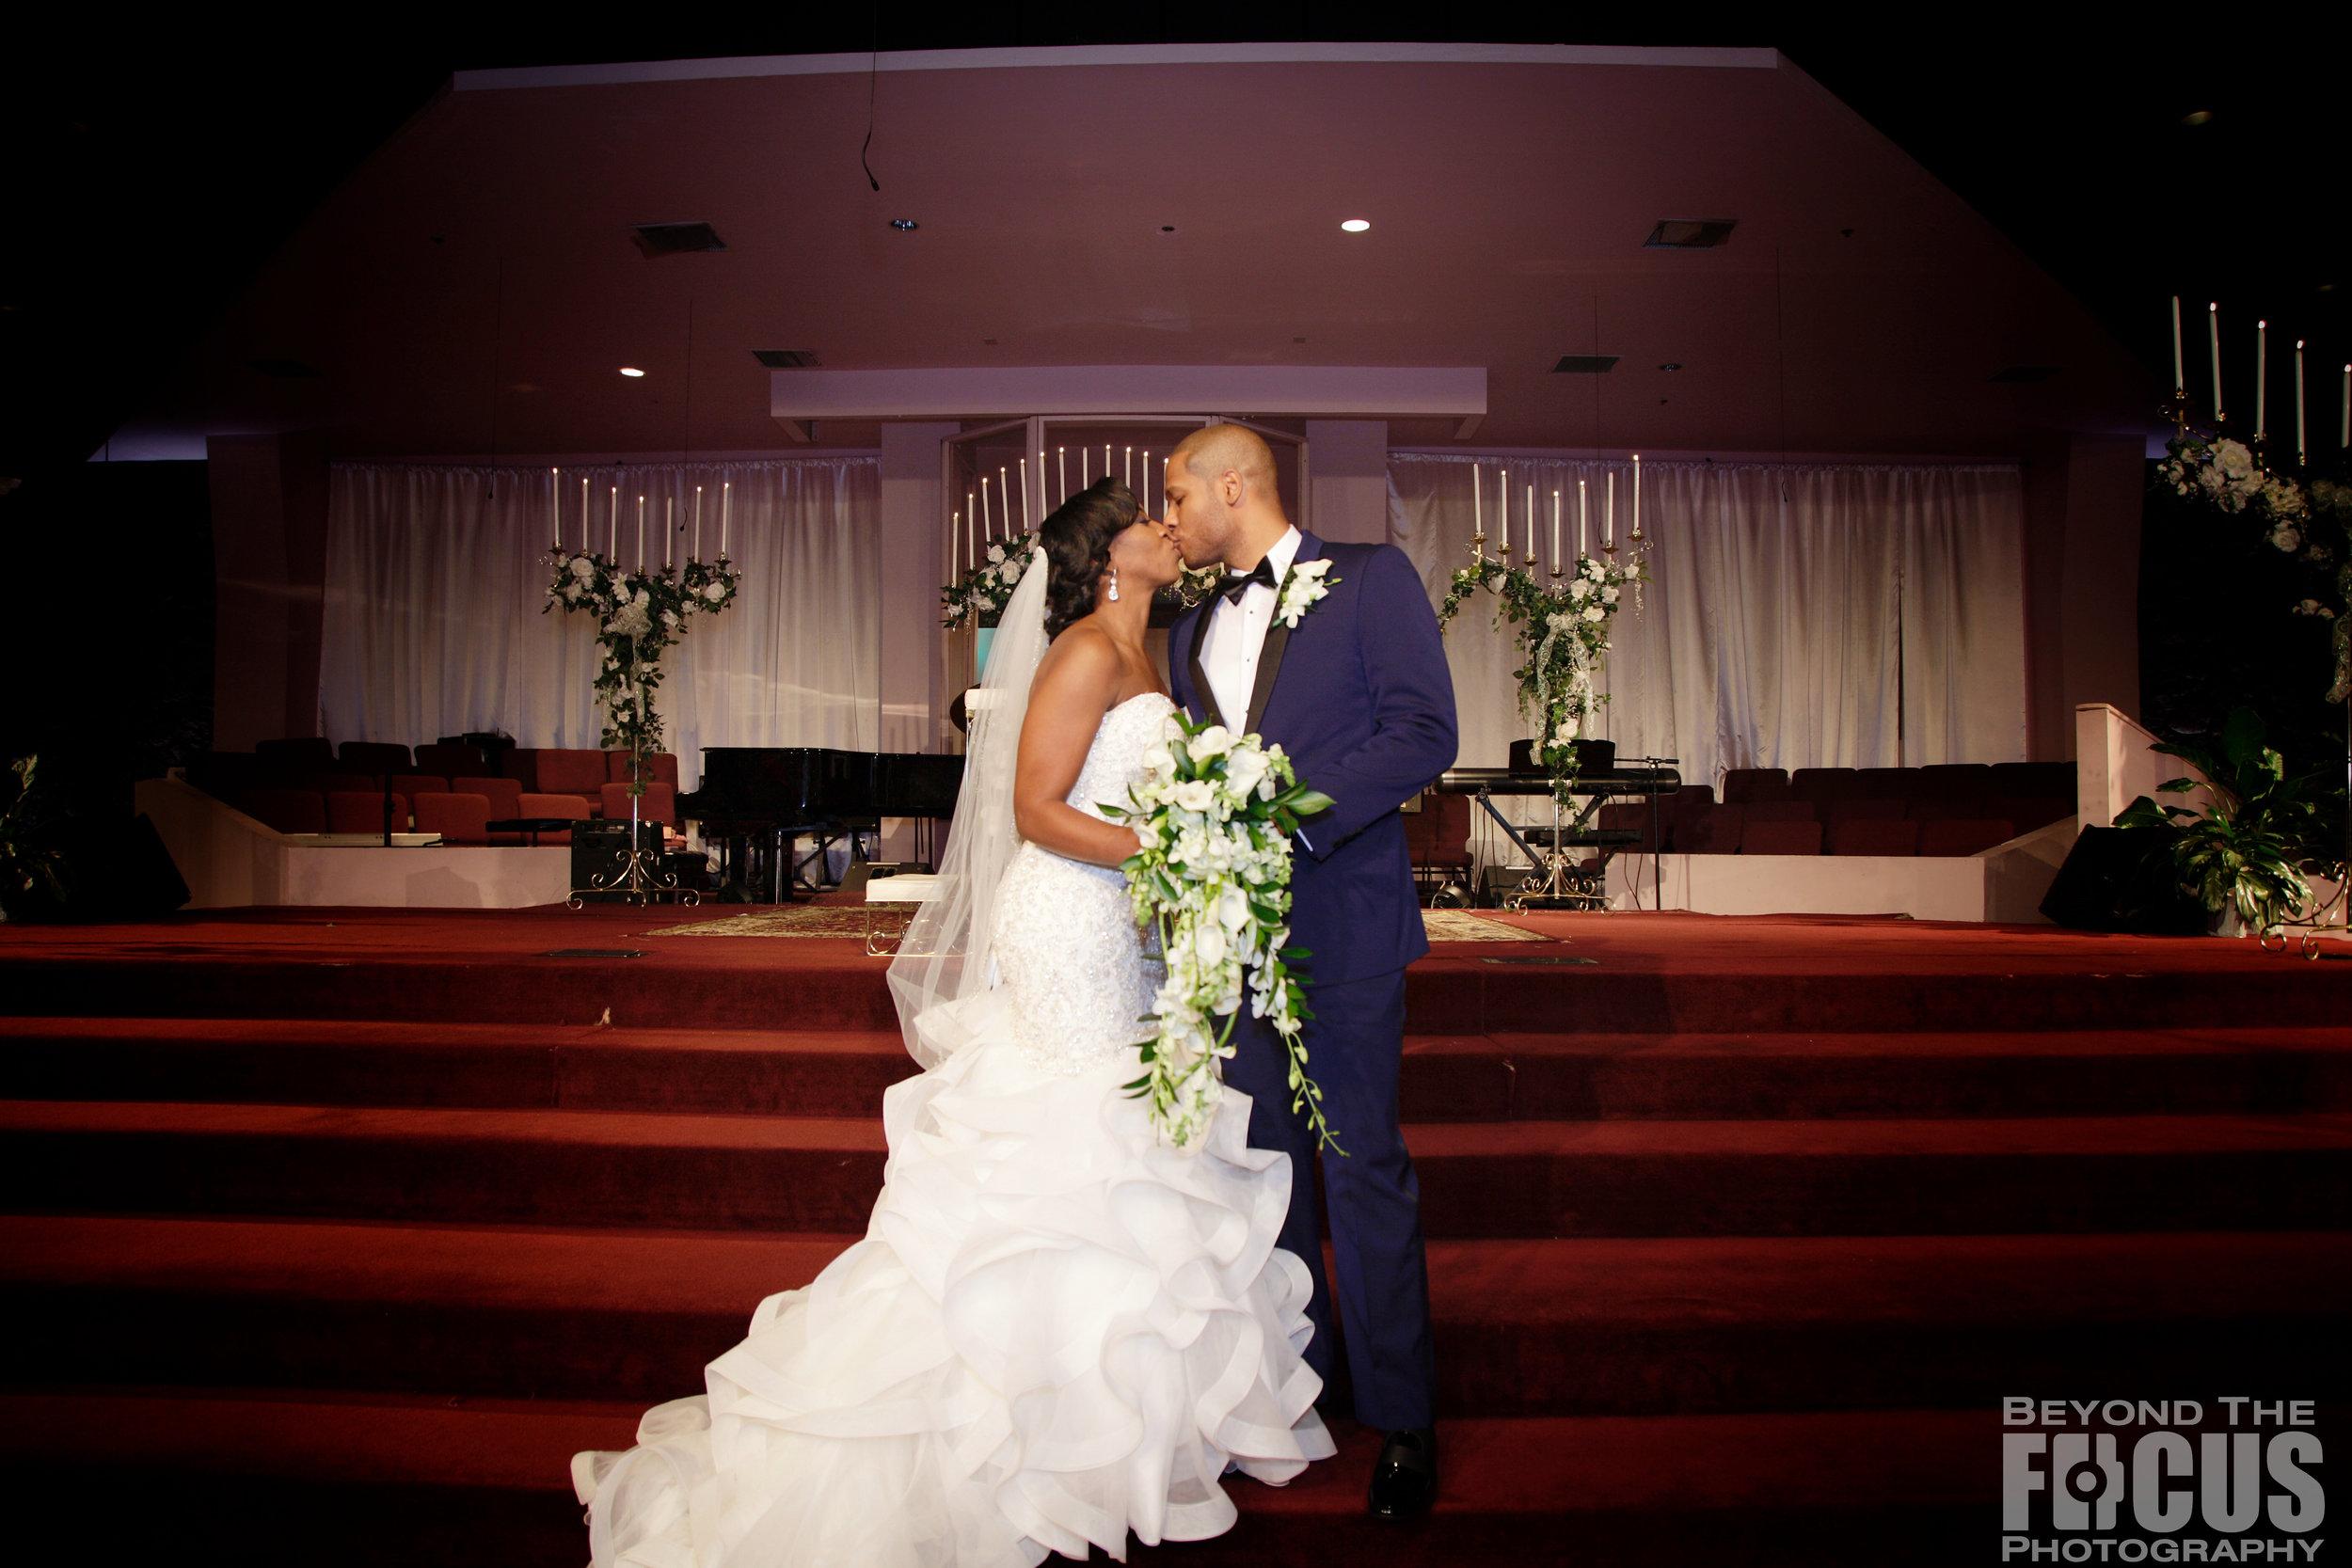 Matthews_Wedding_Ceremony_149.jpg